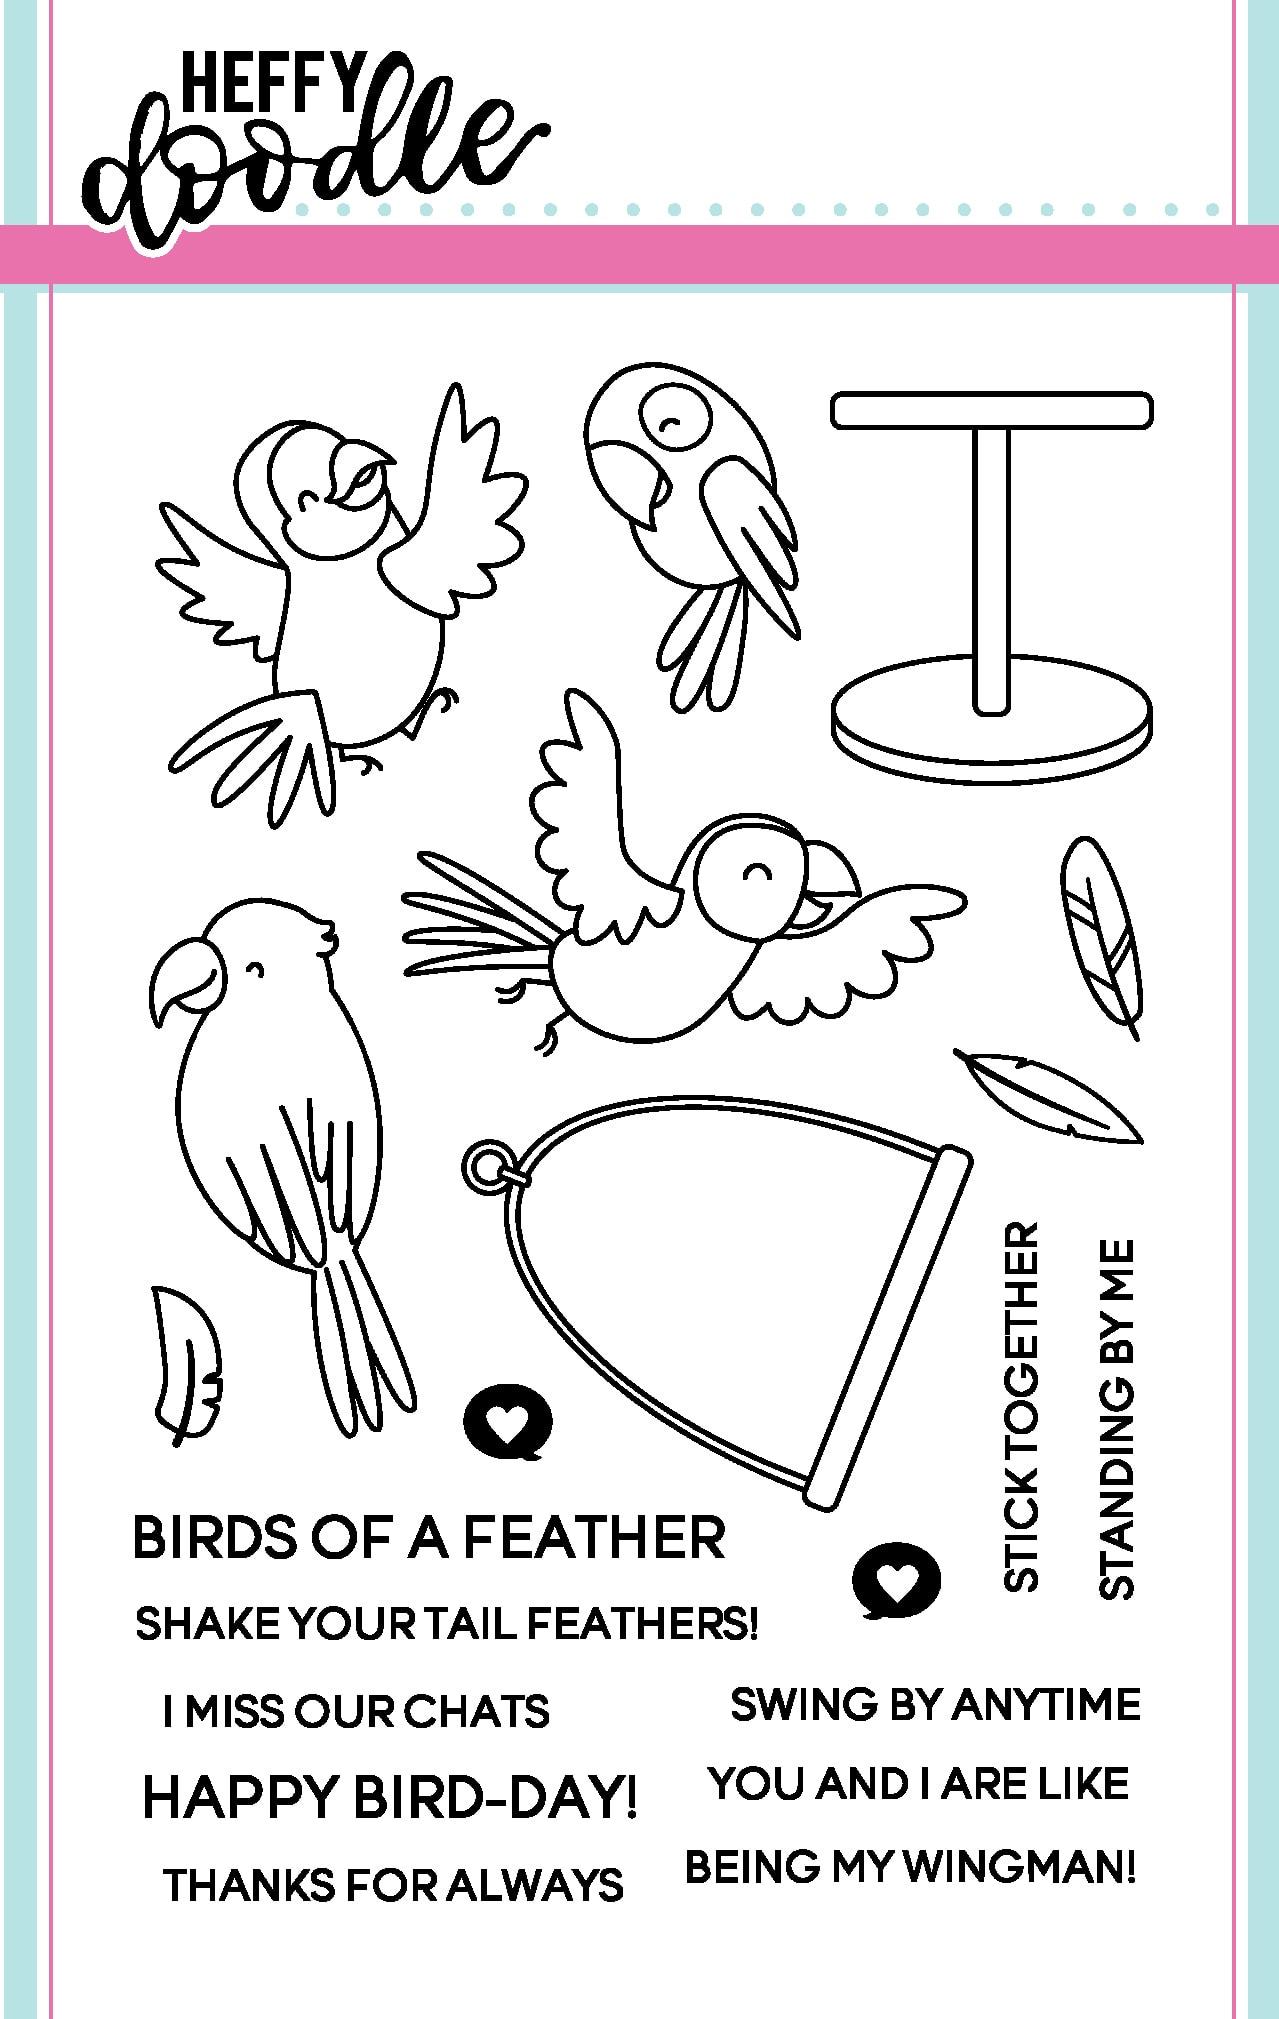 Heffy Doodle Clear Stamp Set: Wingman